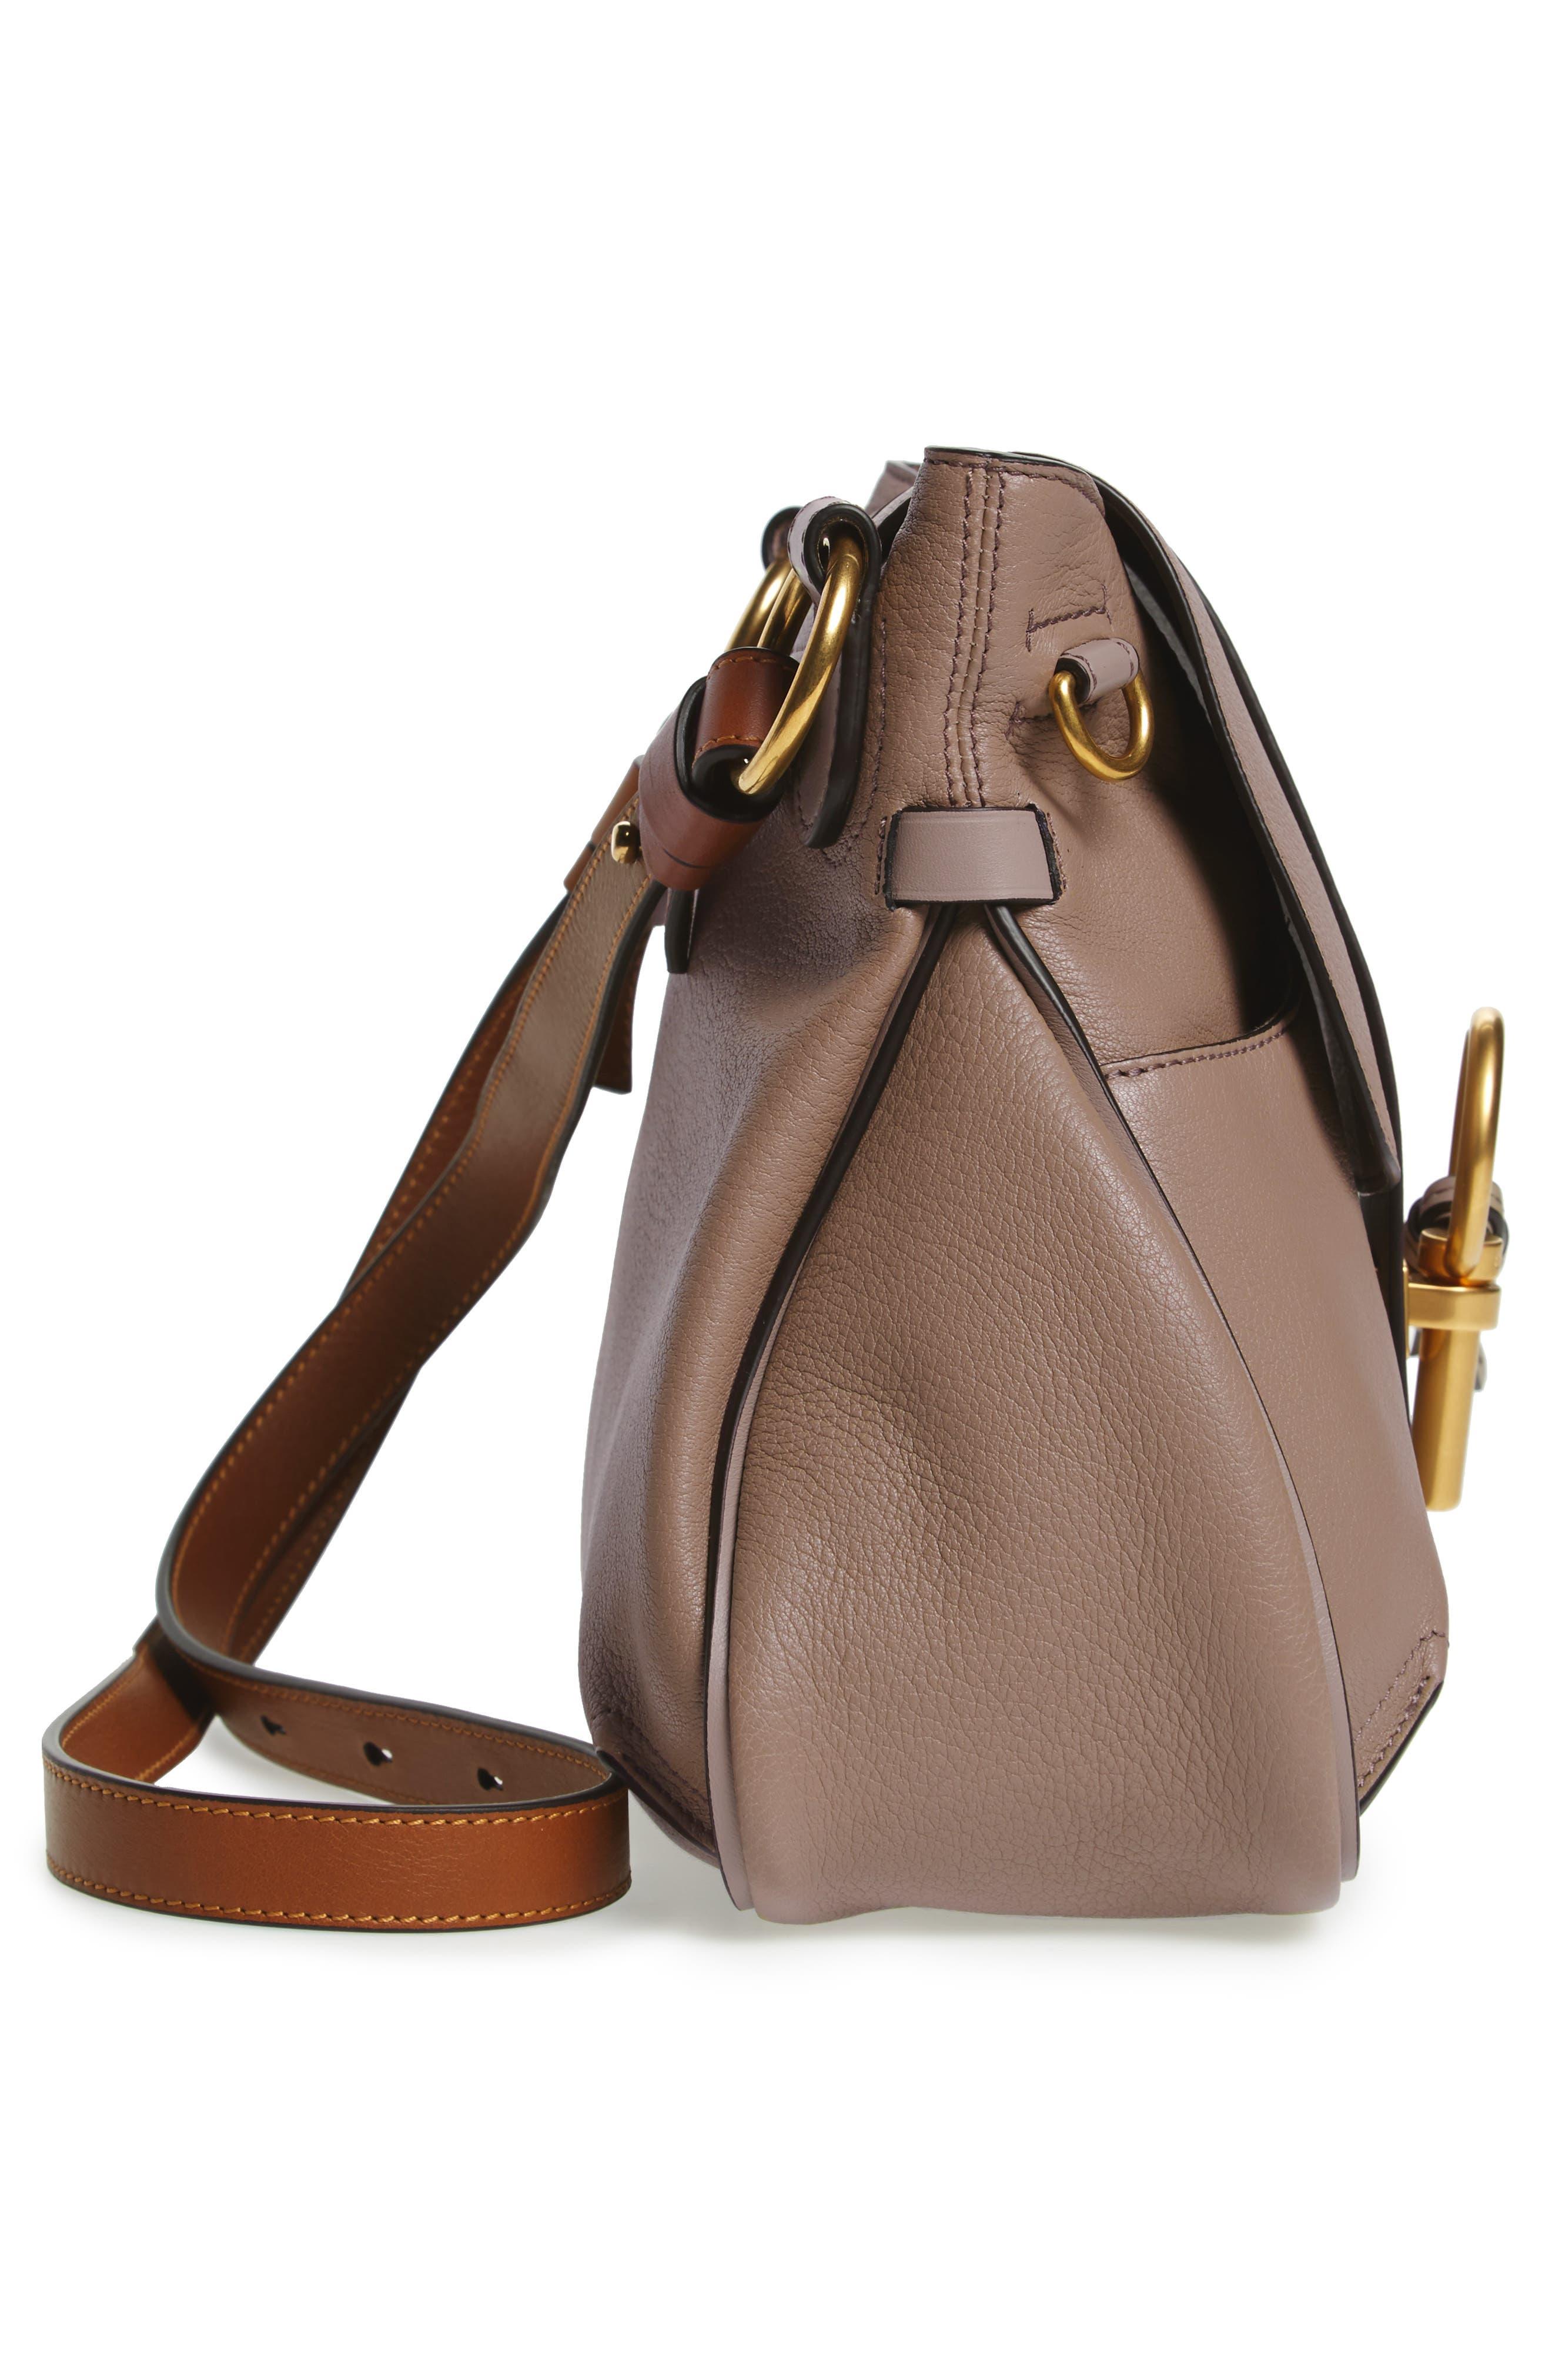 CHLOÉ,                             Small Lexa Leather Shoulder Bag,                             Alternate thumbnail 5, color,                             031